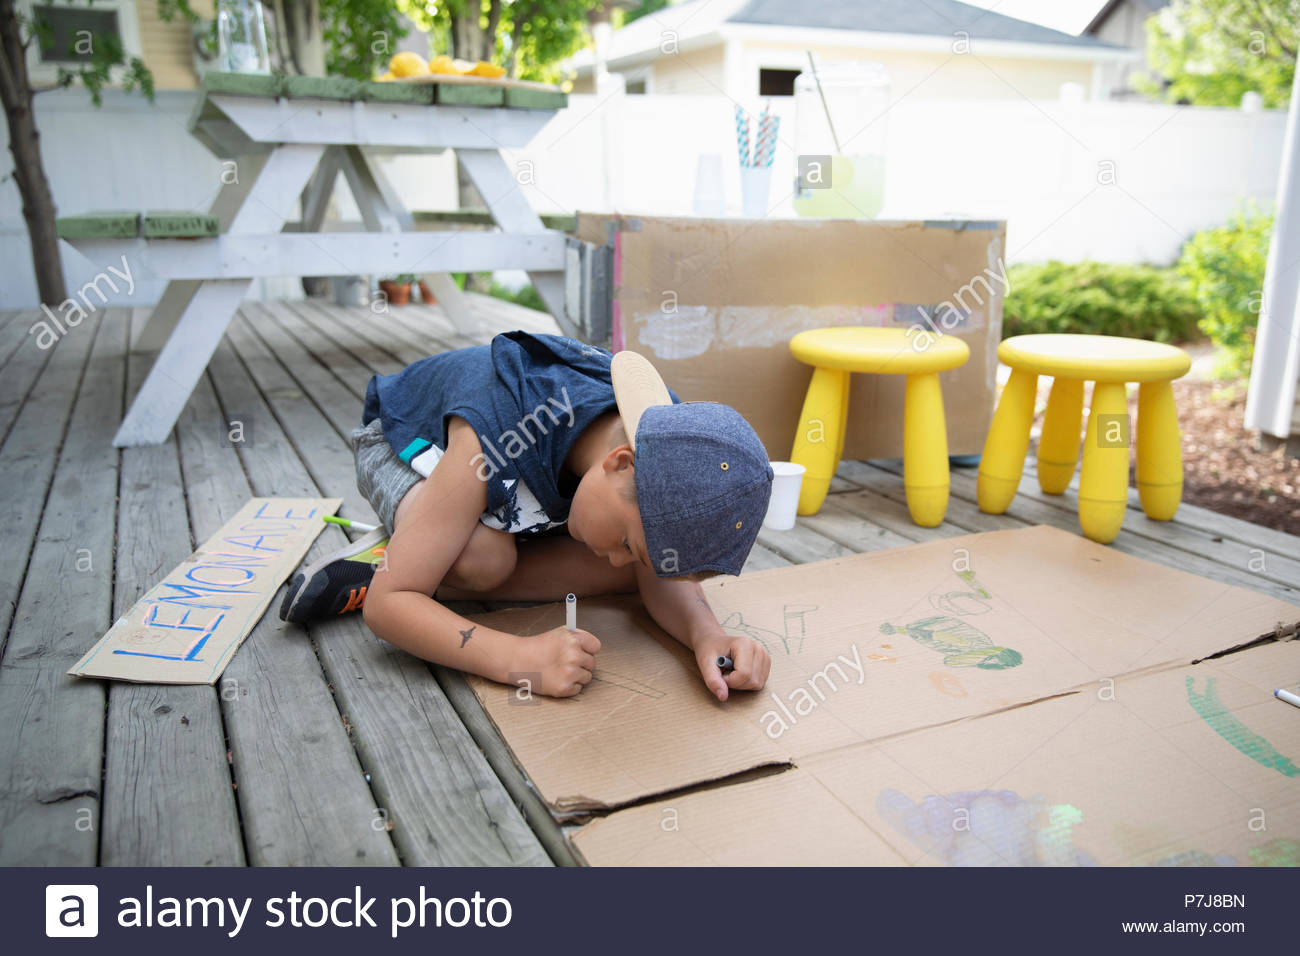 Boy drawing on cardboard, making lemonade stand - Stock Image